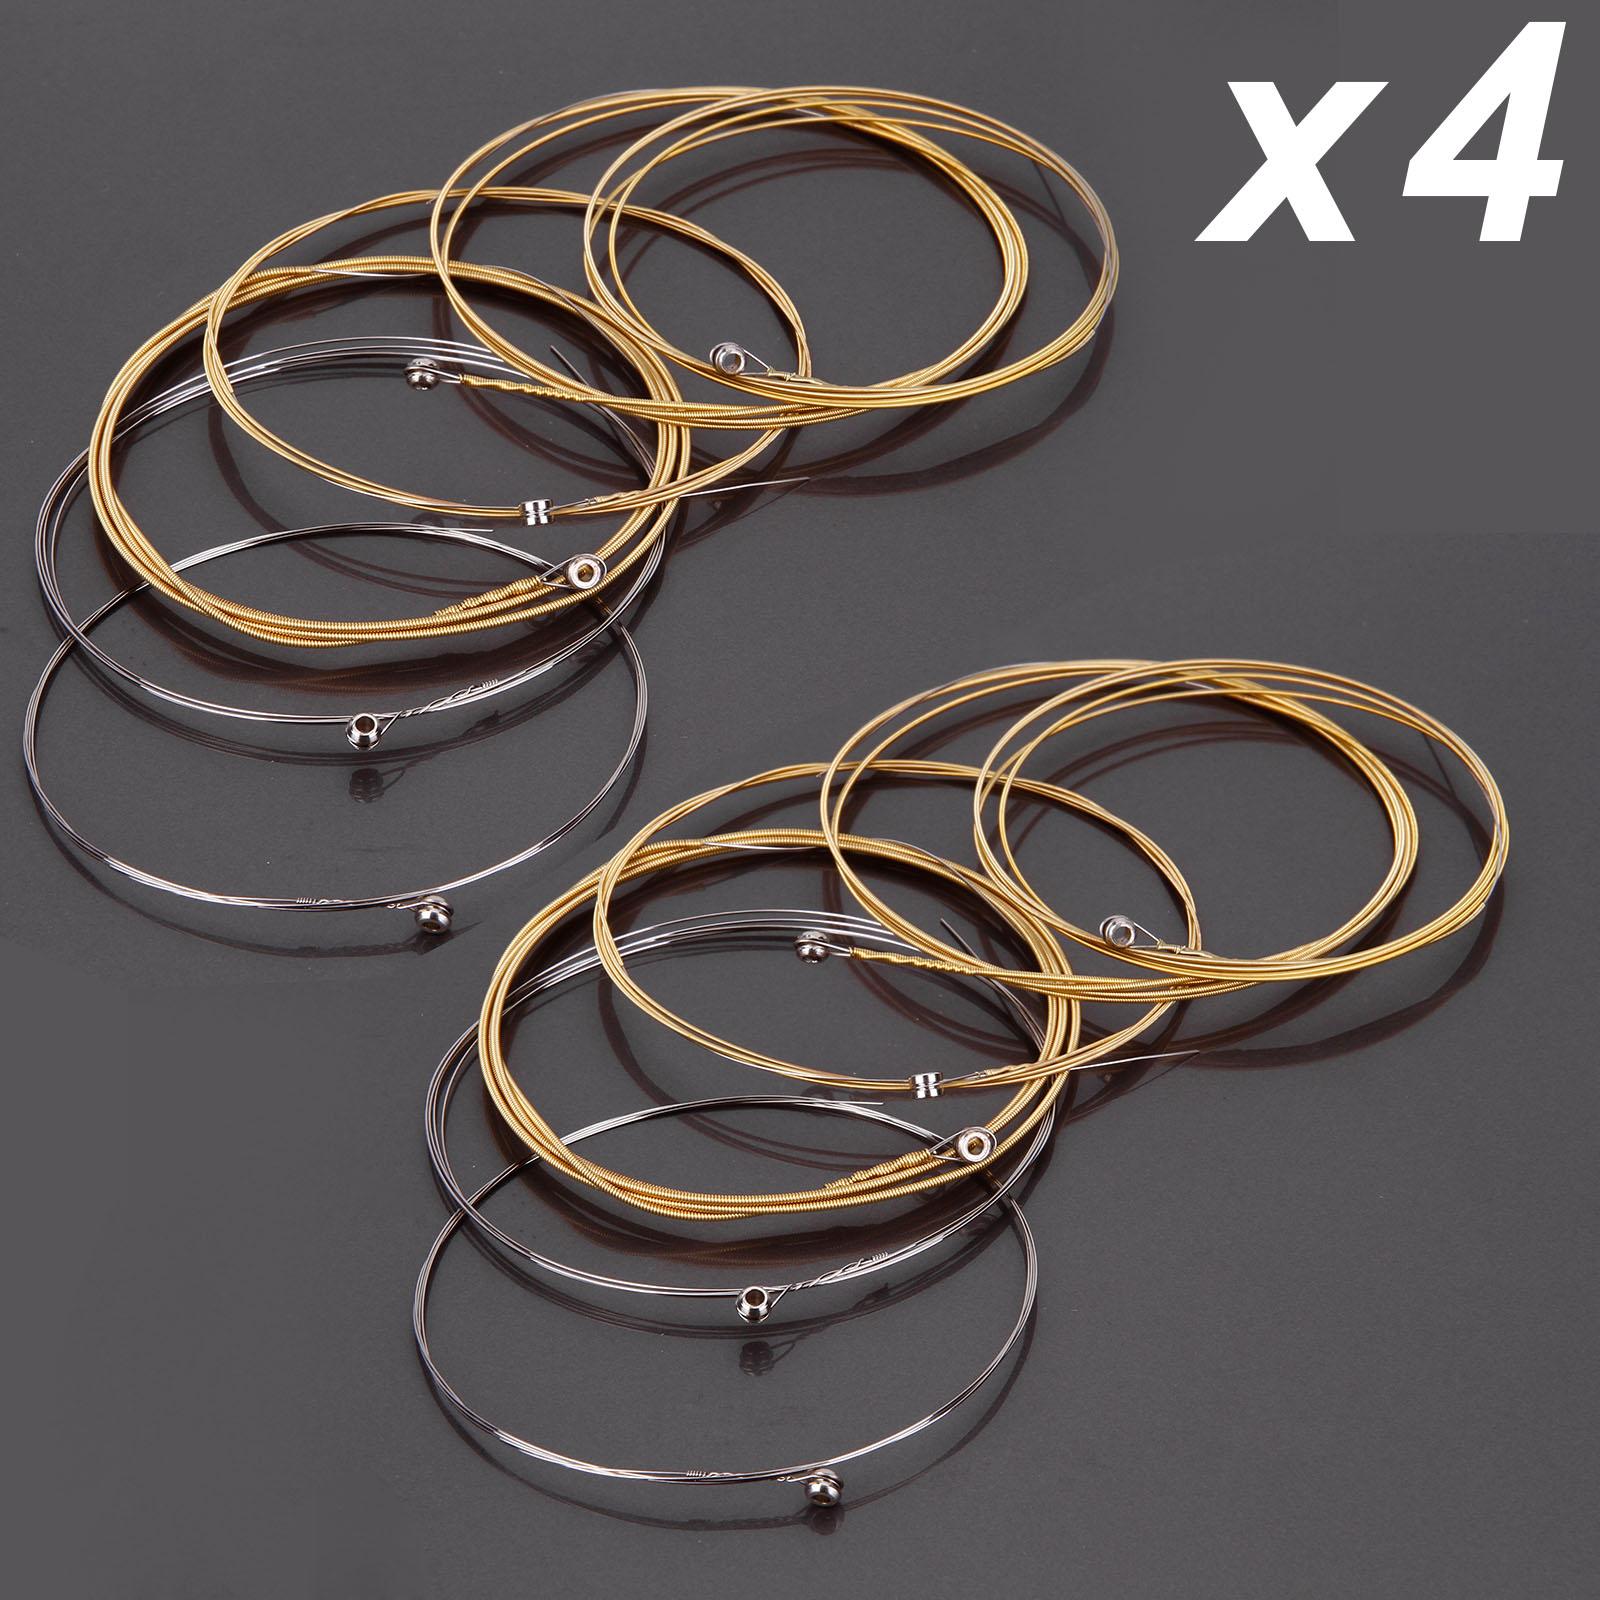 8 sets 48pcs acoustic guitar steel strings gauge accessories replacement ebay. Black Bedroom Furniture Sets. Home Design Ideas